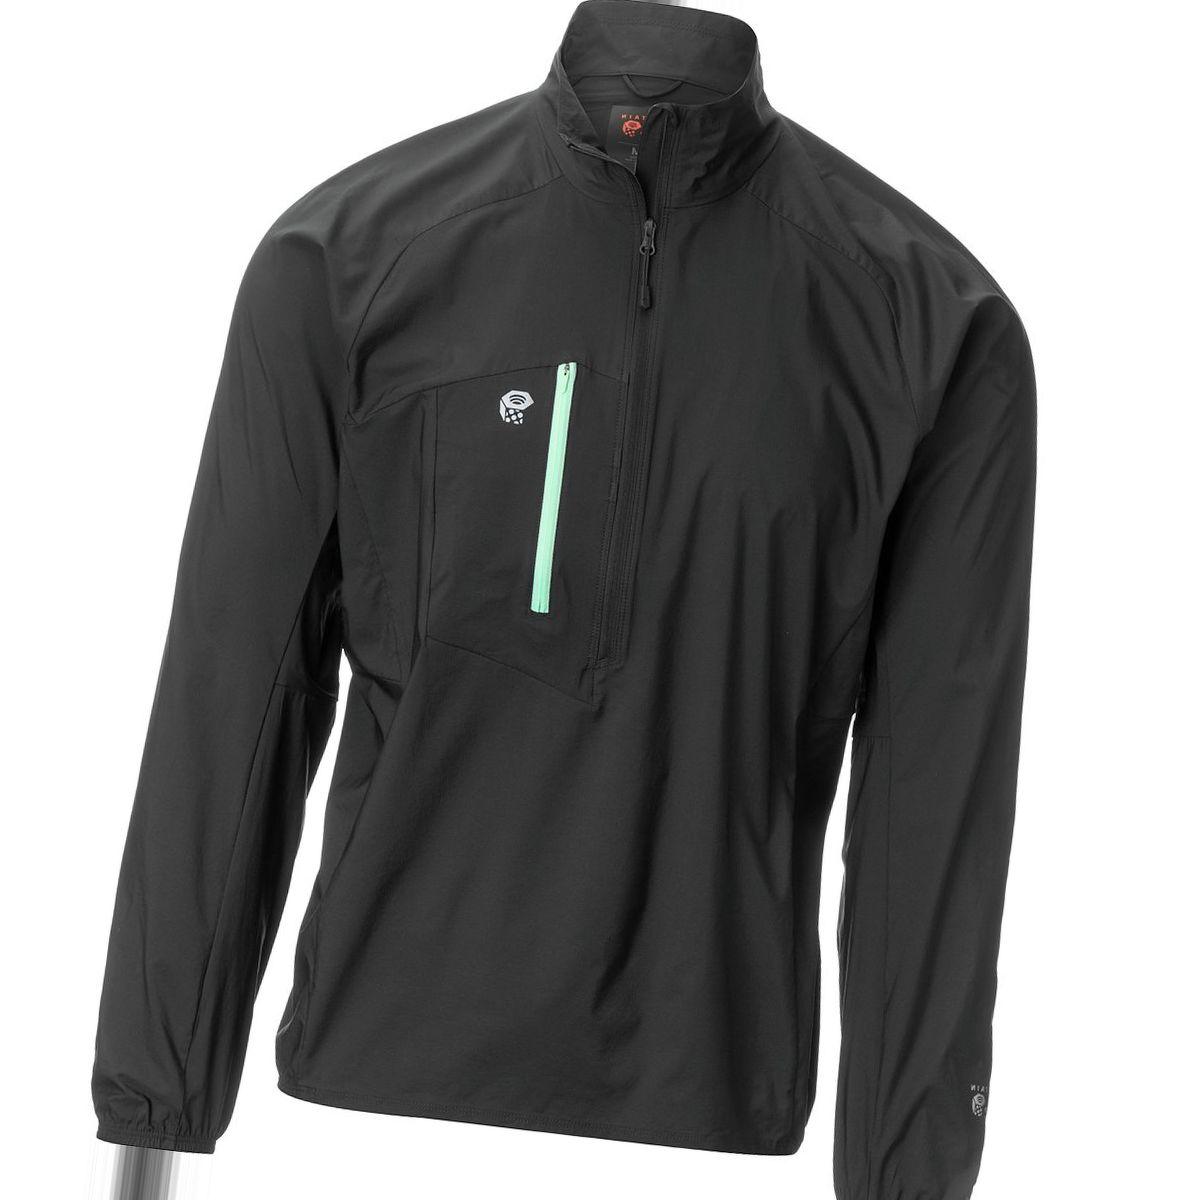 Mountain Hardwear Kor Preshell Pullover Jacket - Men's